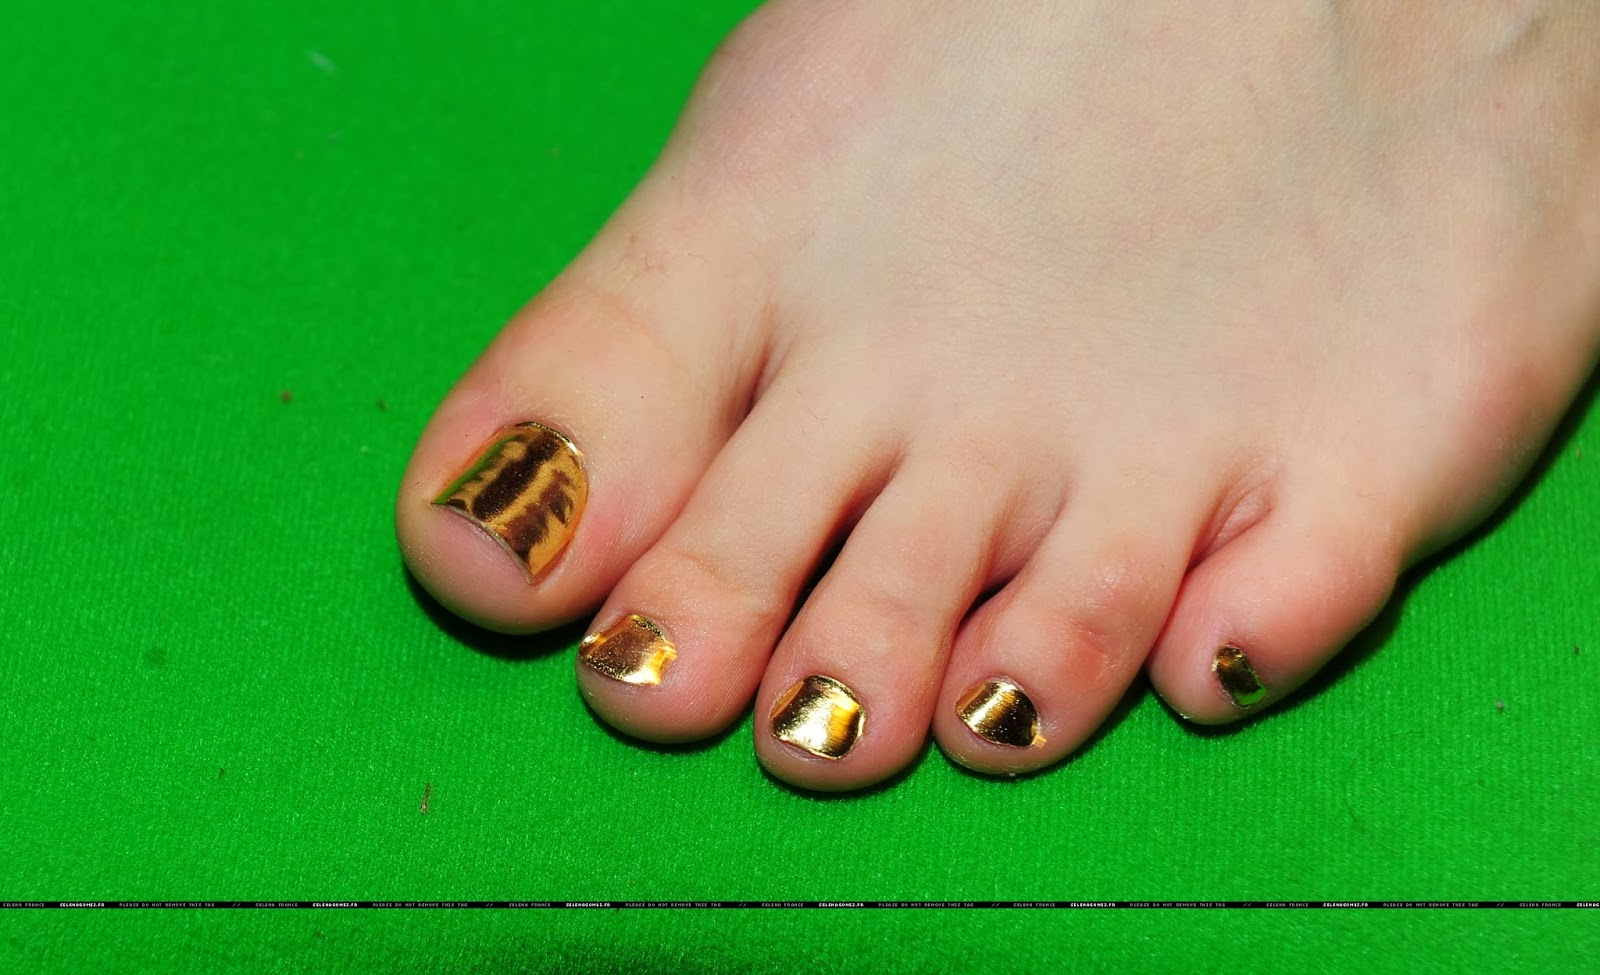 selena gomez naked with feet